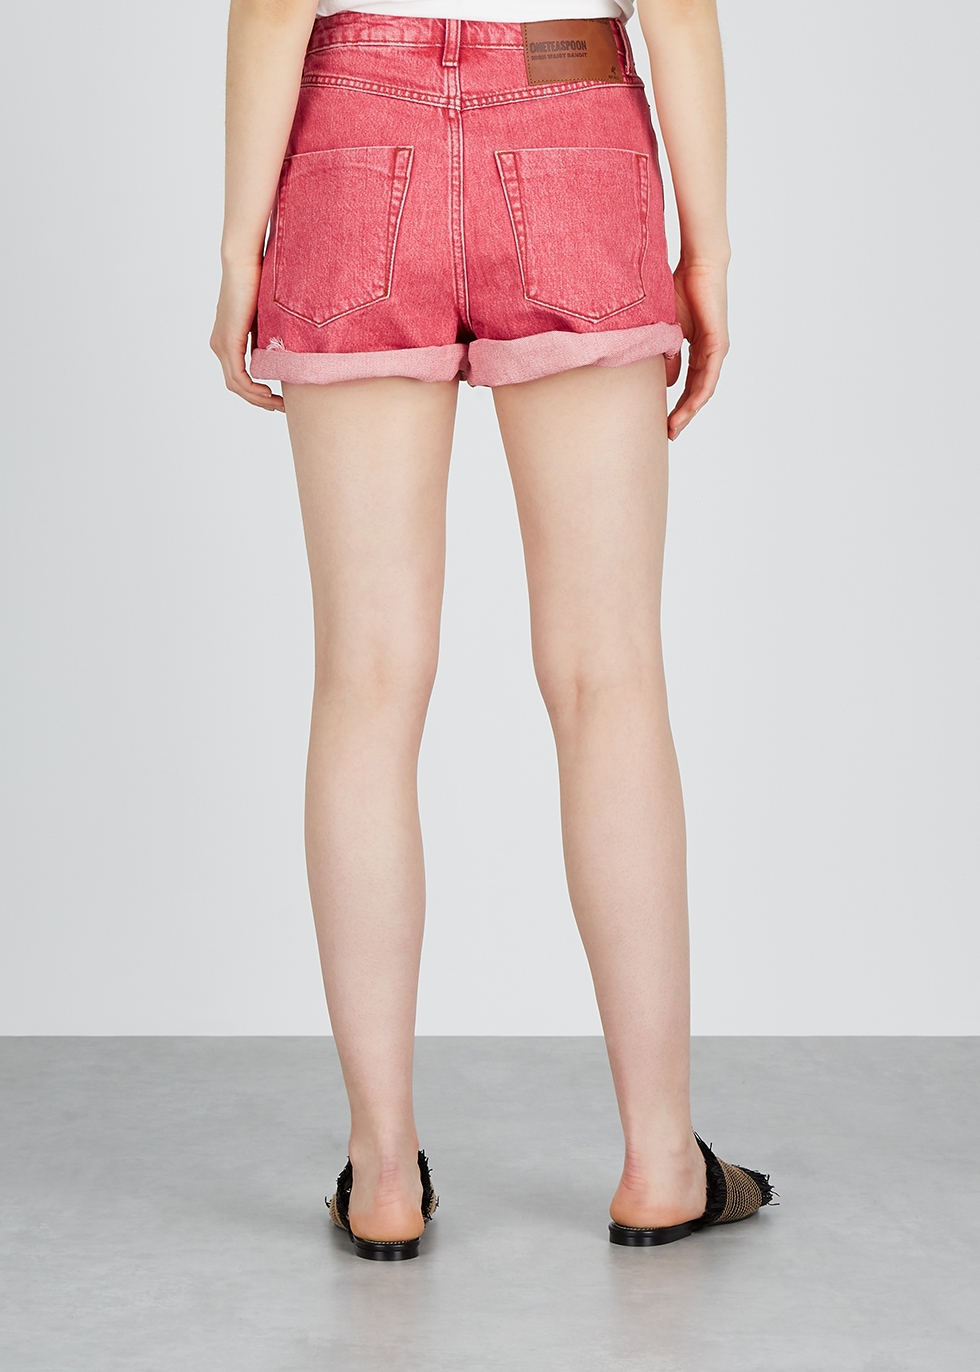 Bandit red distressed denim shorts - Oneteaspoon